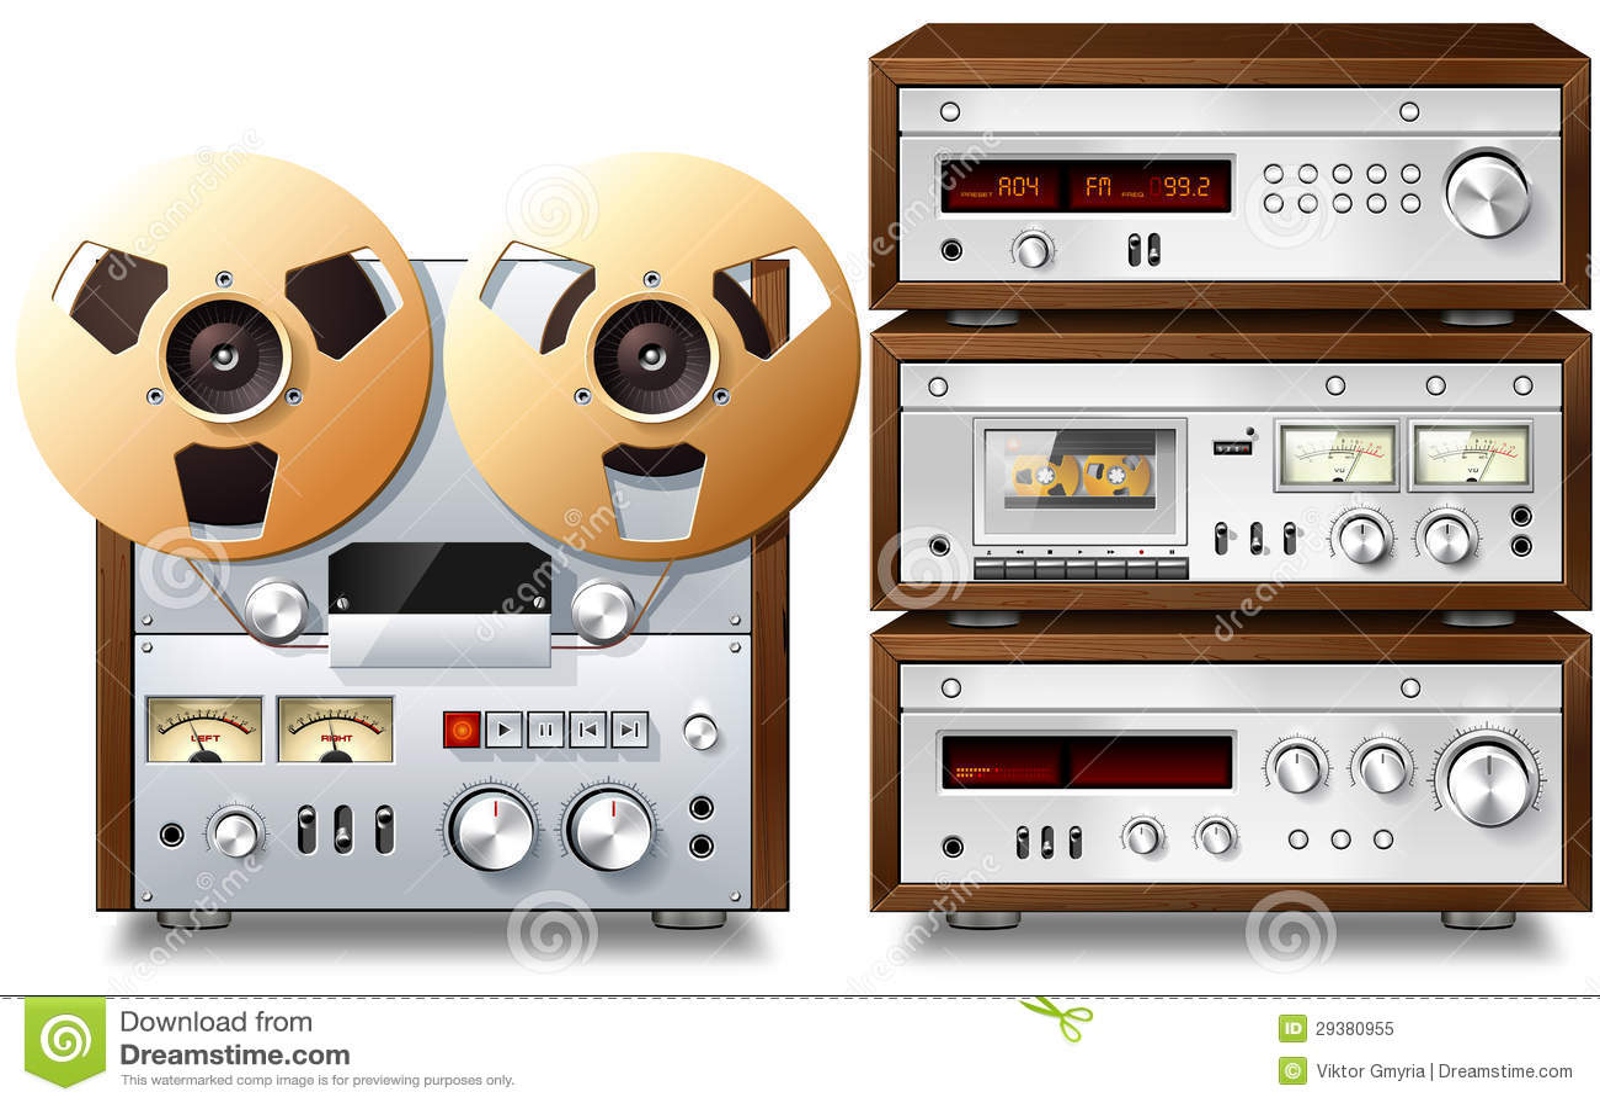 vintage stereo appraisal free